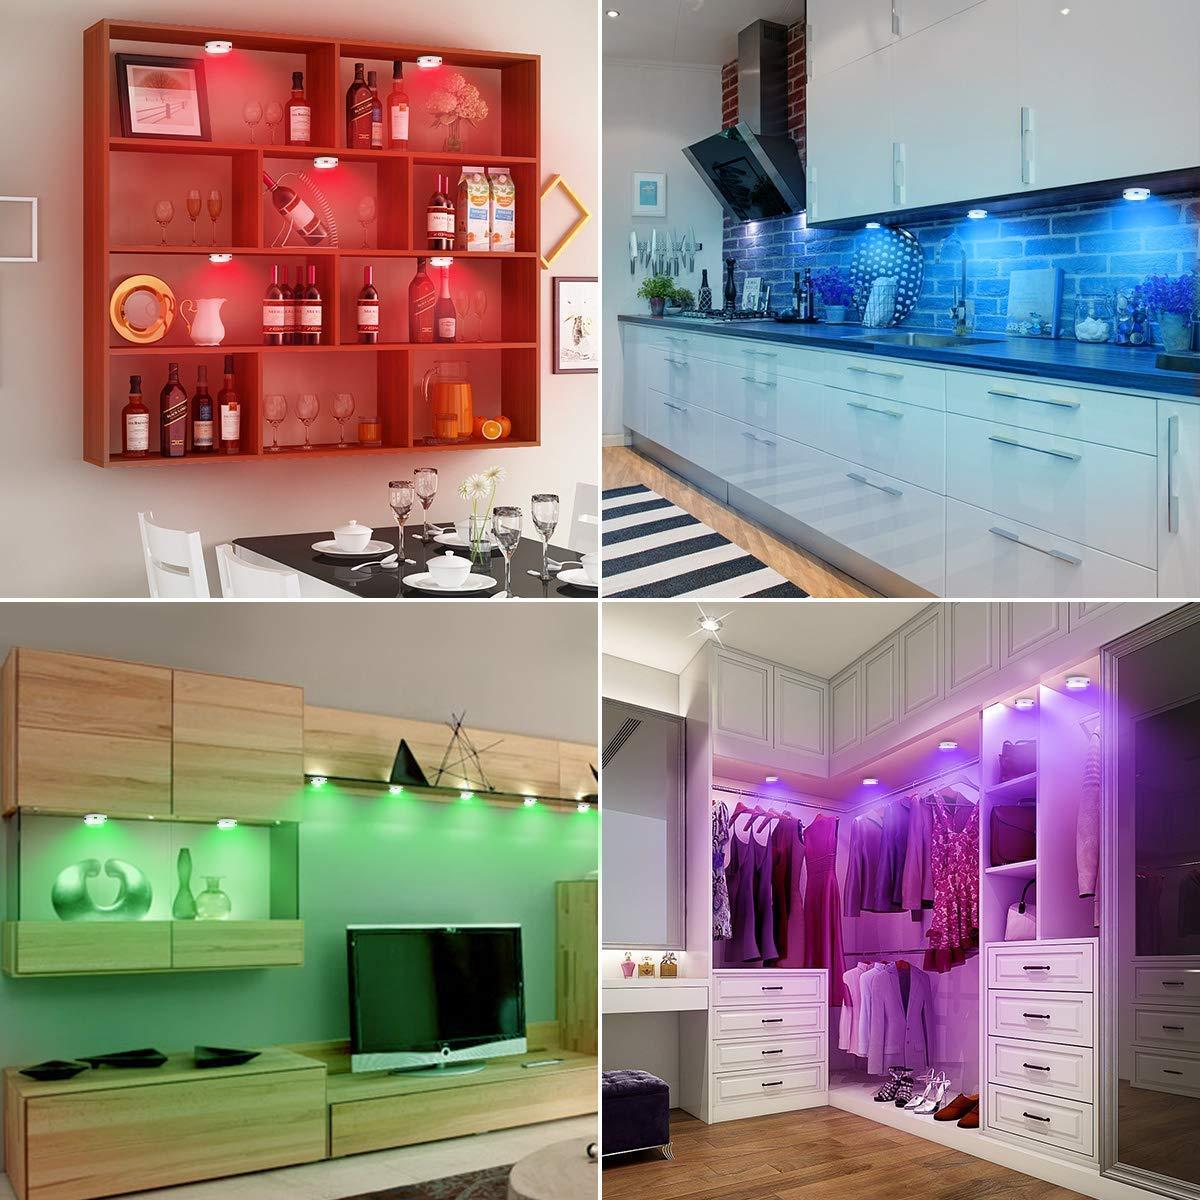 Kanavi 6 Packs Luces Nocturnas LED Inal/ámbricas con 2 Remoto,16 Colores Brillo Ajustable Alimentado por Bater/ía para Iluminaci/ón de Armarios etc no Incluido Luces para Gabinetes LED